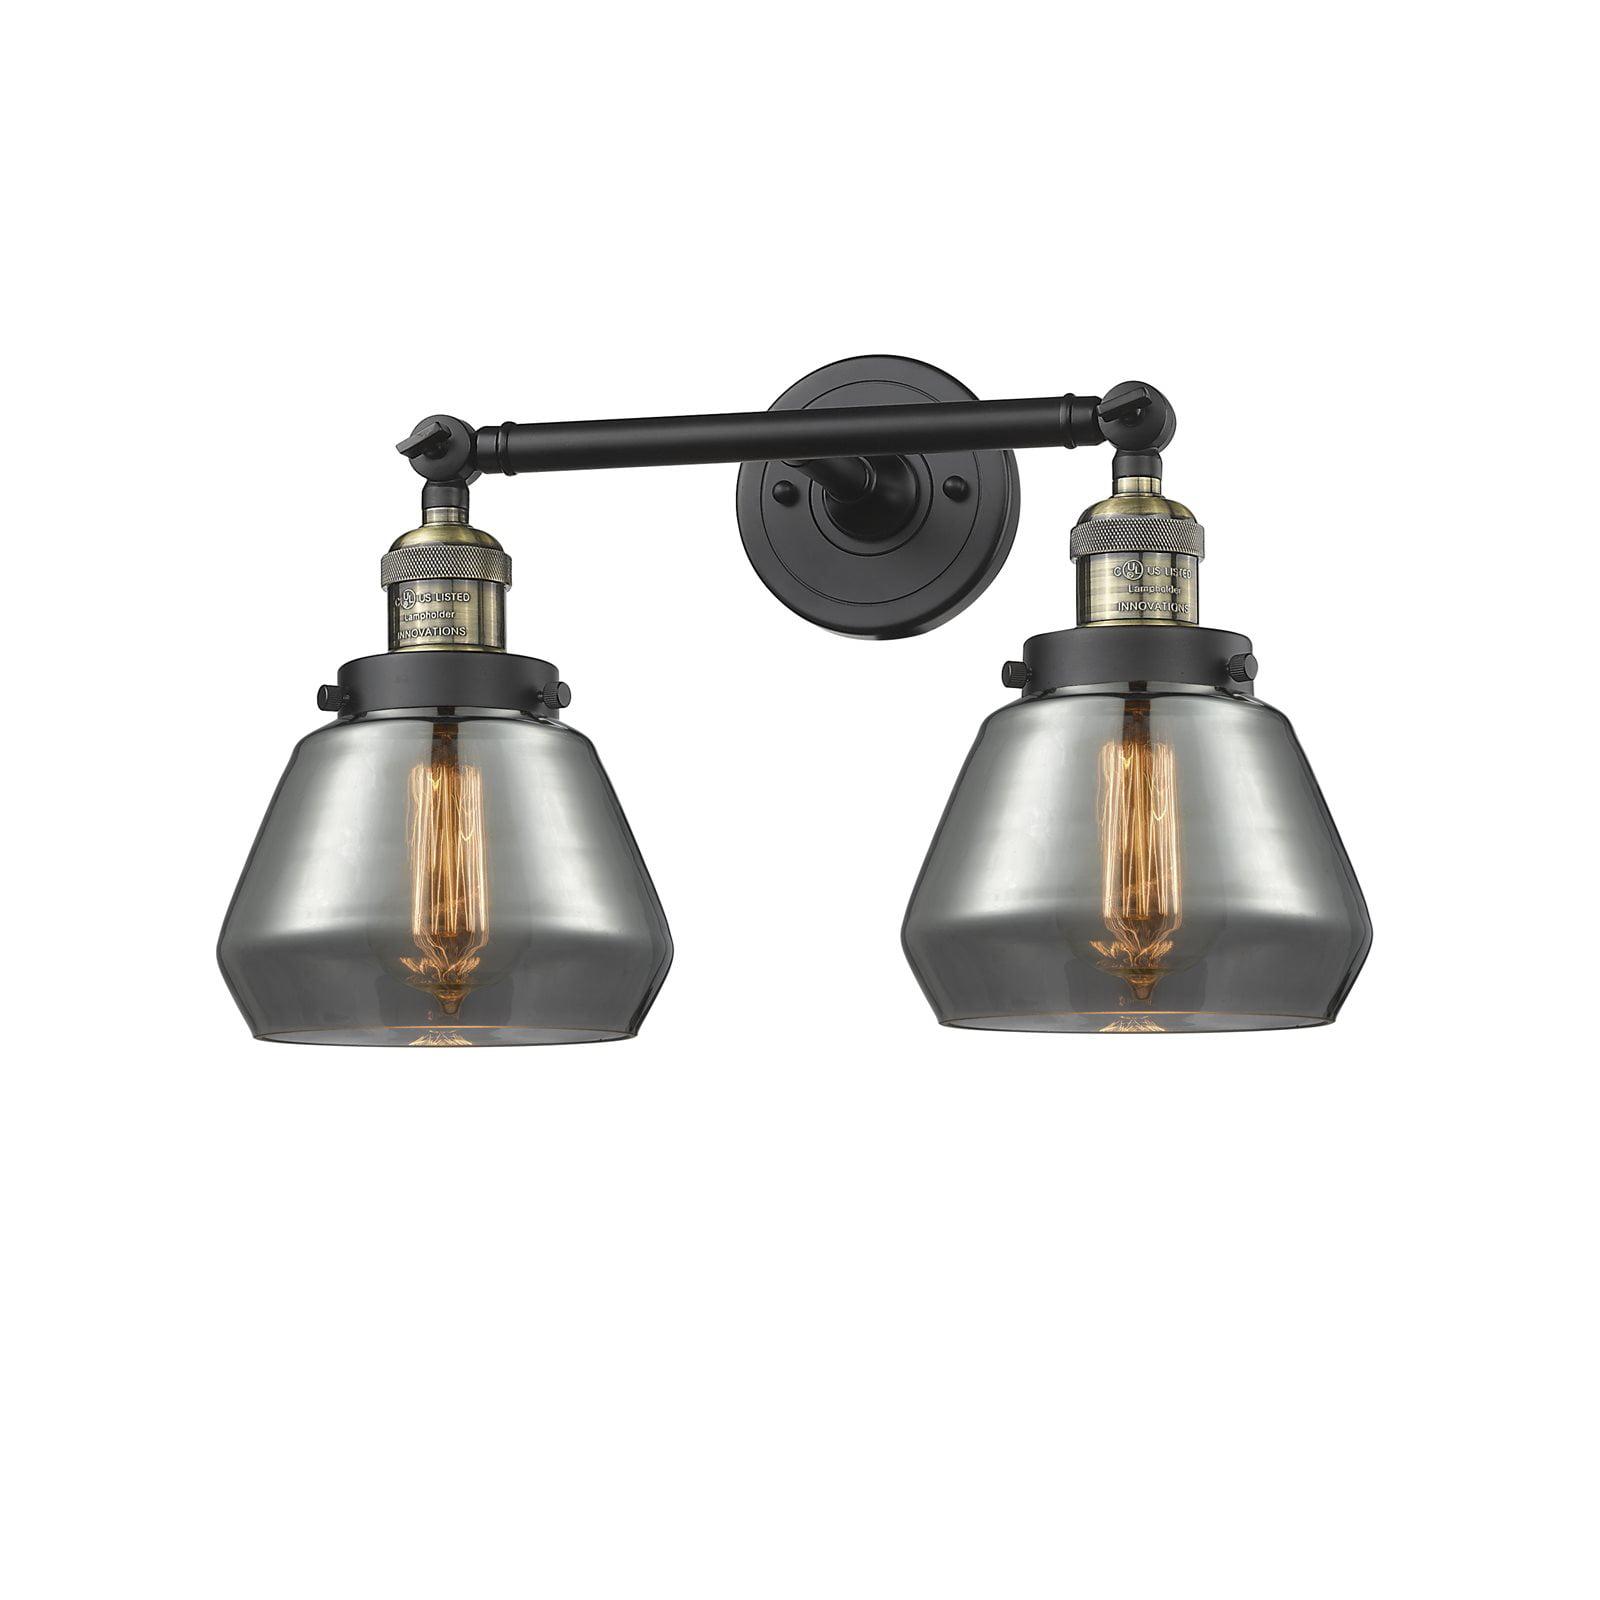 "Innovations 2-LT LED Fulton 16.5"" Bathroom Fixture Black Brushed Brass 208-BBB-G173-LED by"